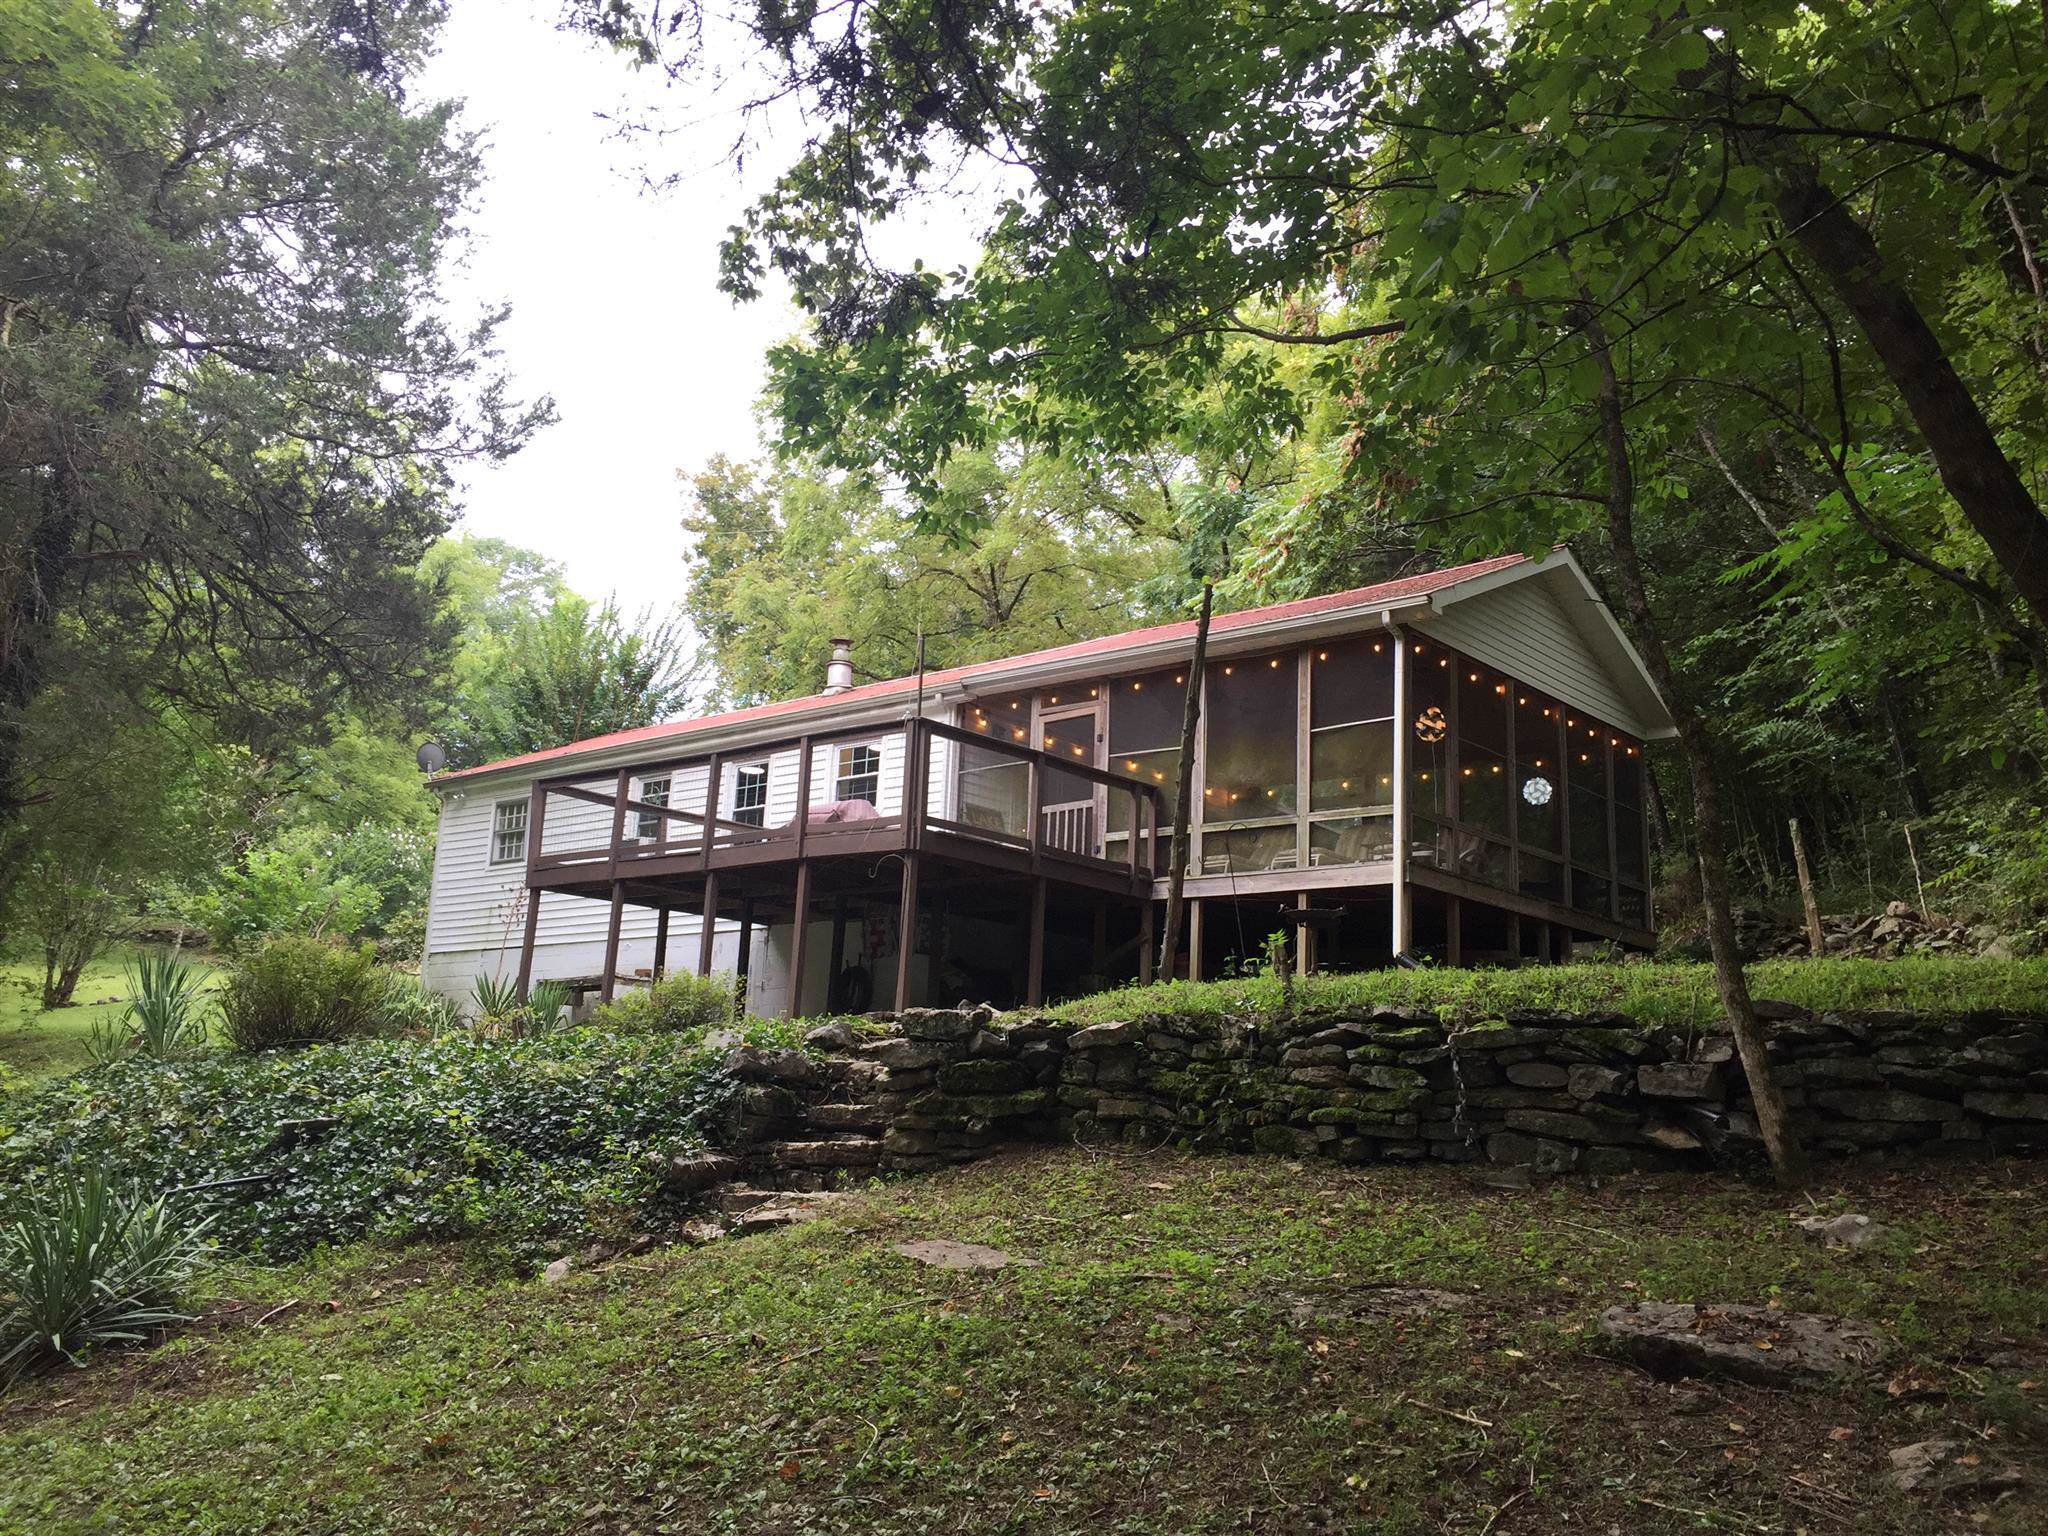 6446 Coconut Ridge Rd, Smithville, TN 37166 (MLS #RTC2073078) :: Berkshire Hathaway HomeServices Woodmont Realty